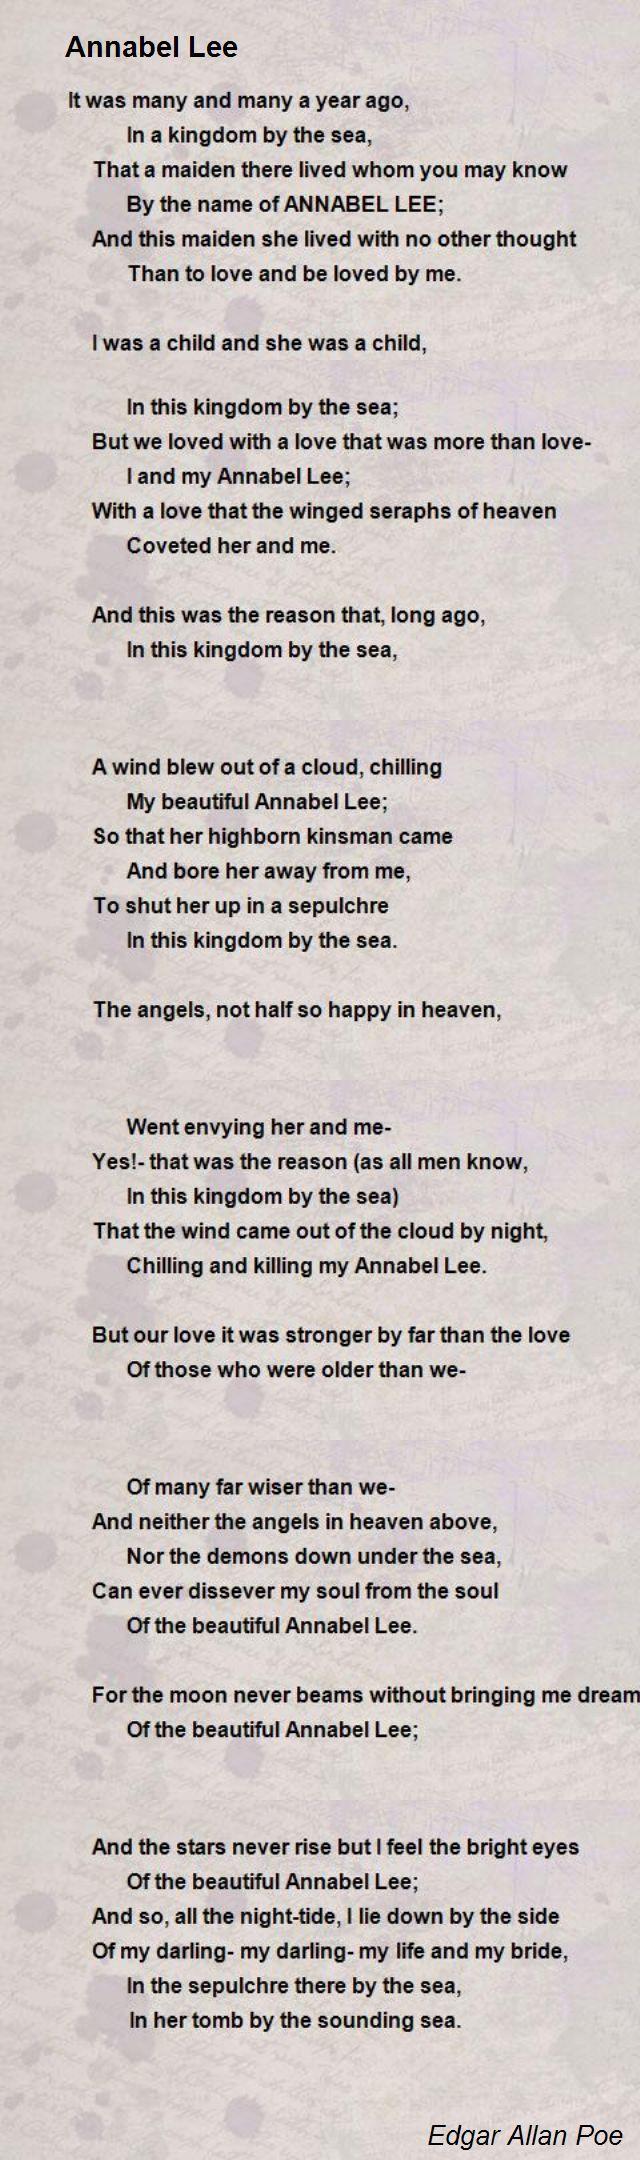 Annabel Lee Poem By Edgar Allan Poe Poem Hunter Poems Annabel Lee Poe Quotes